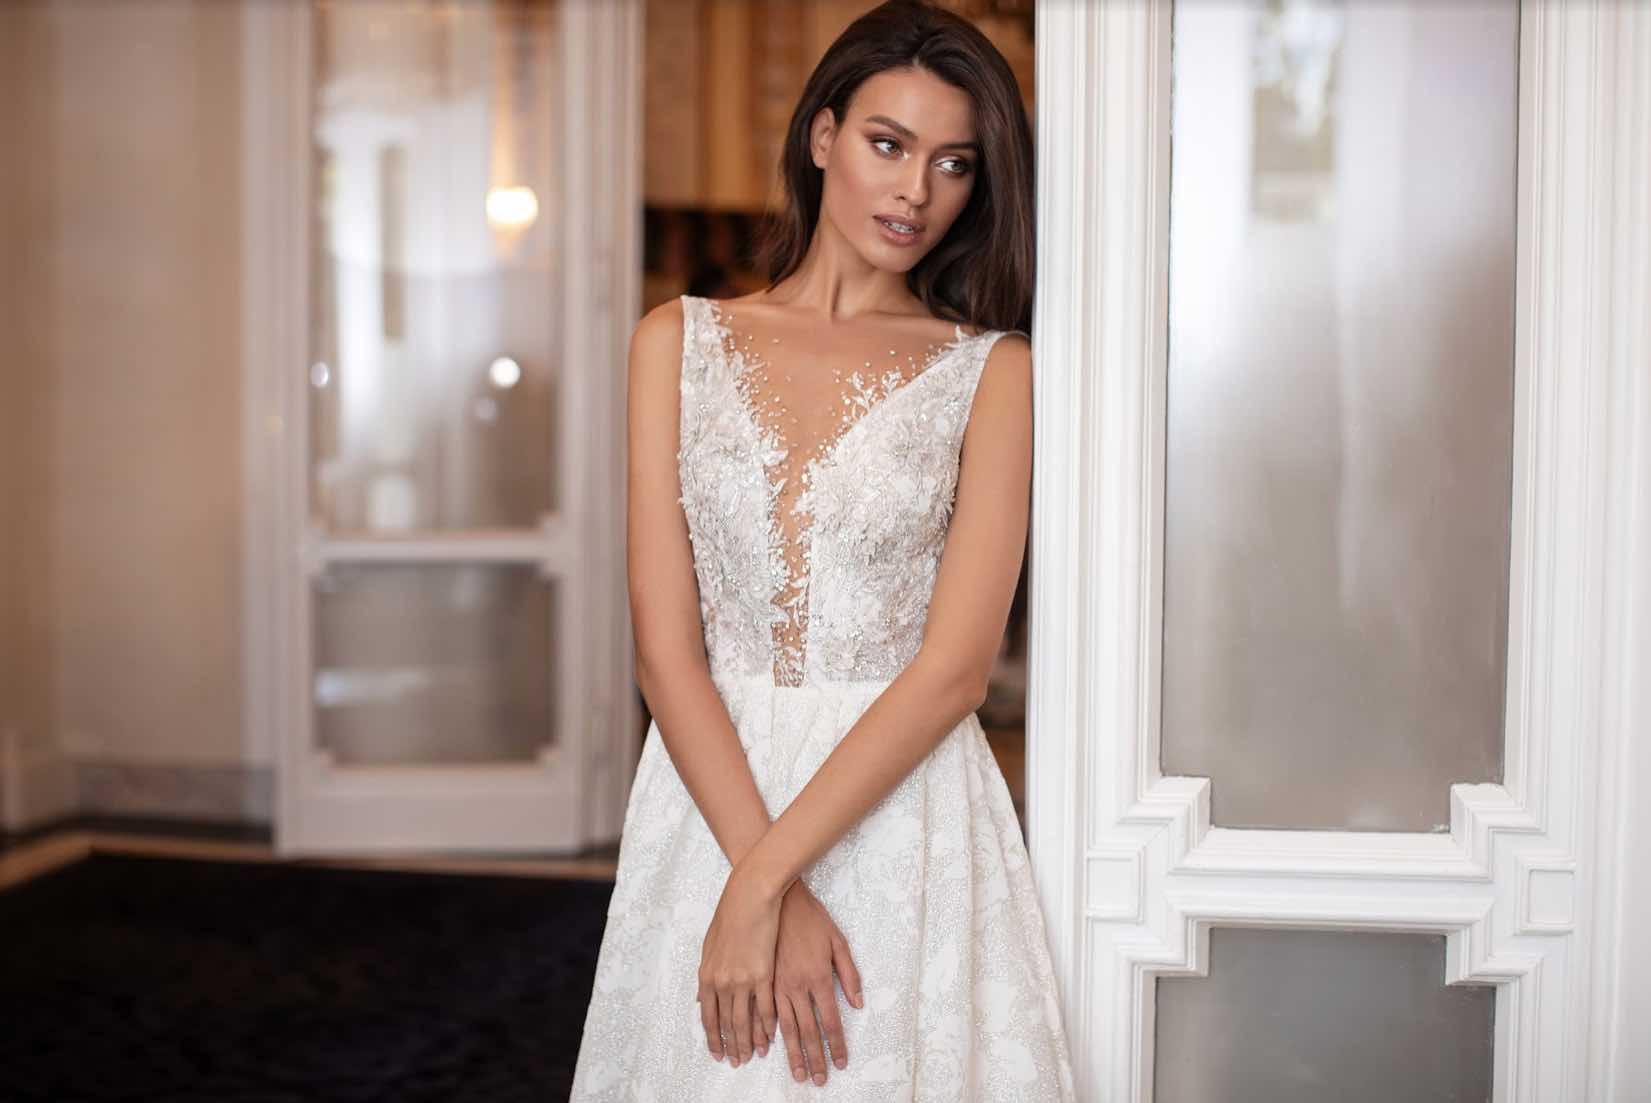 OLGA,Milla Nova, Royal, Blushing Bridal Boutique